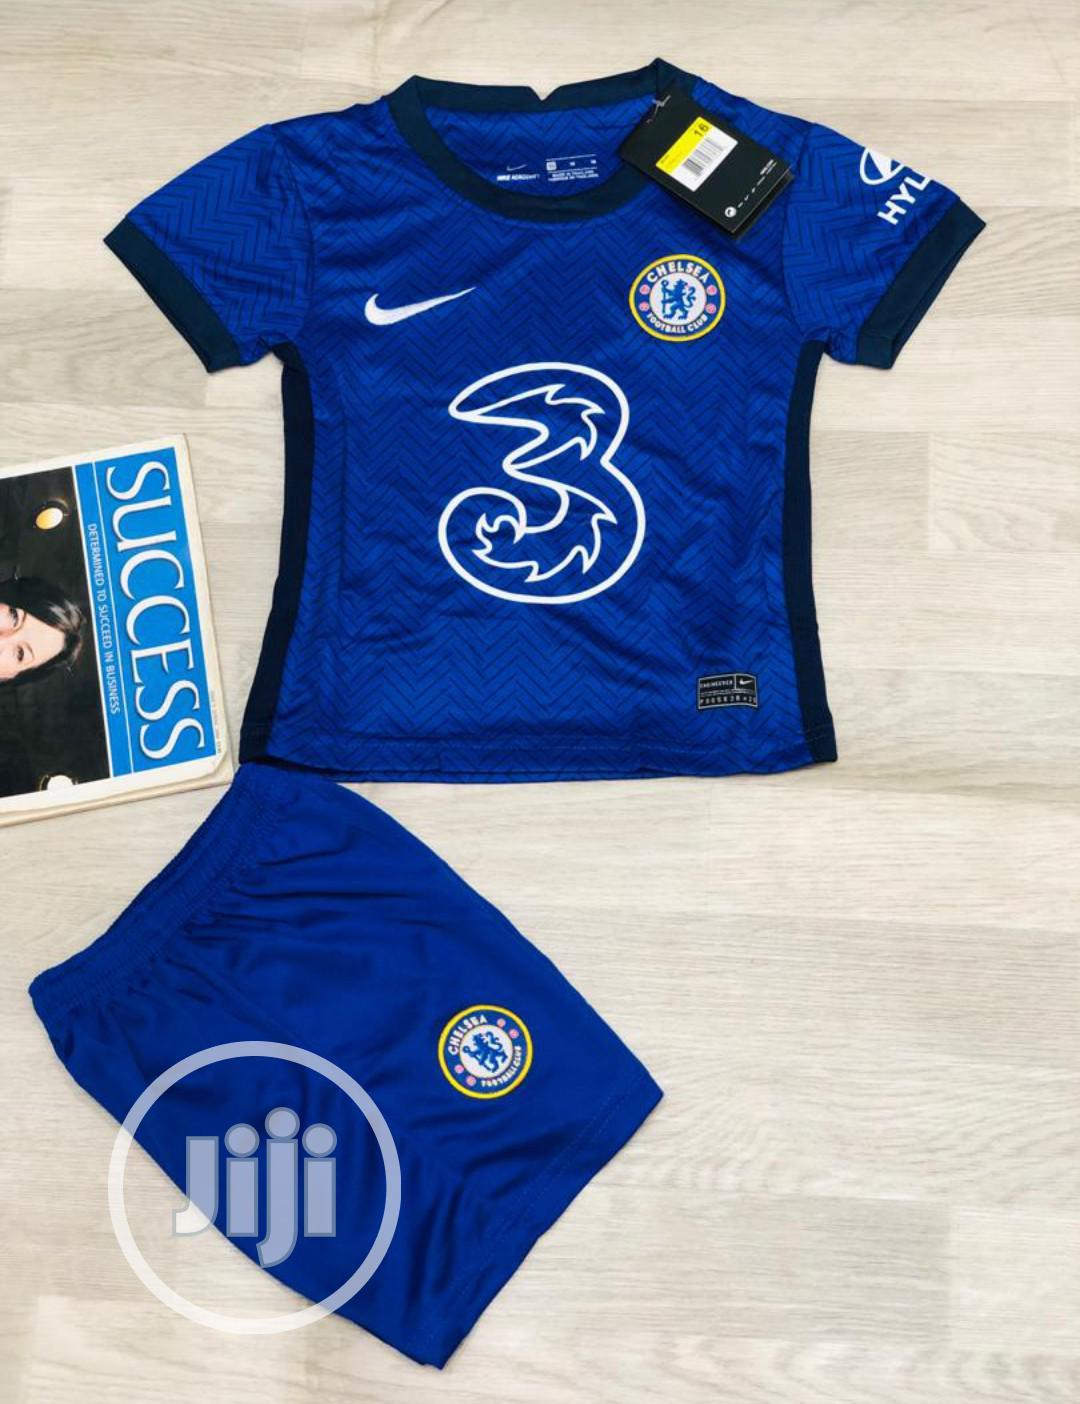 Authentic Chelsea FC 2020/21 Season Children Jersey